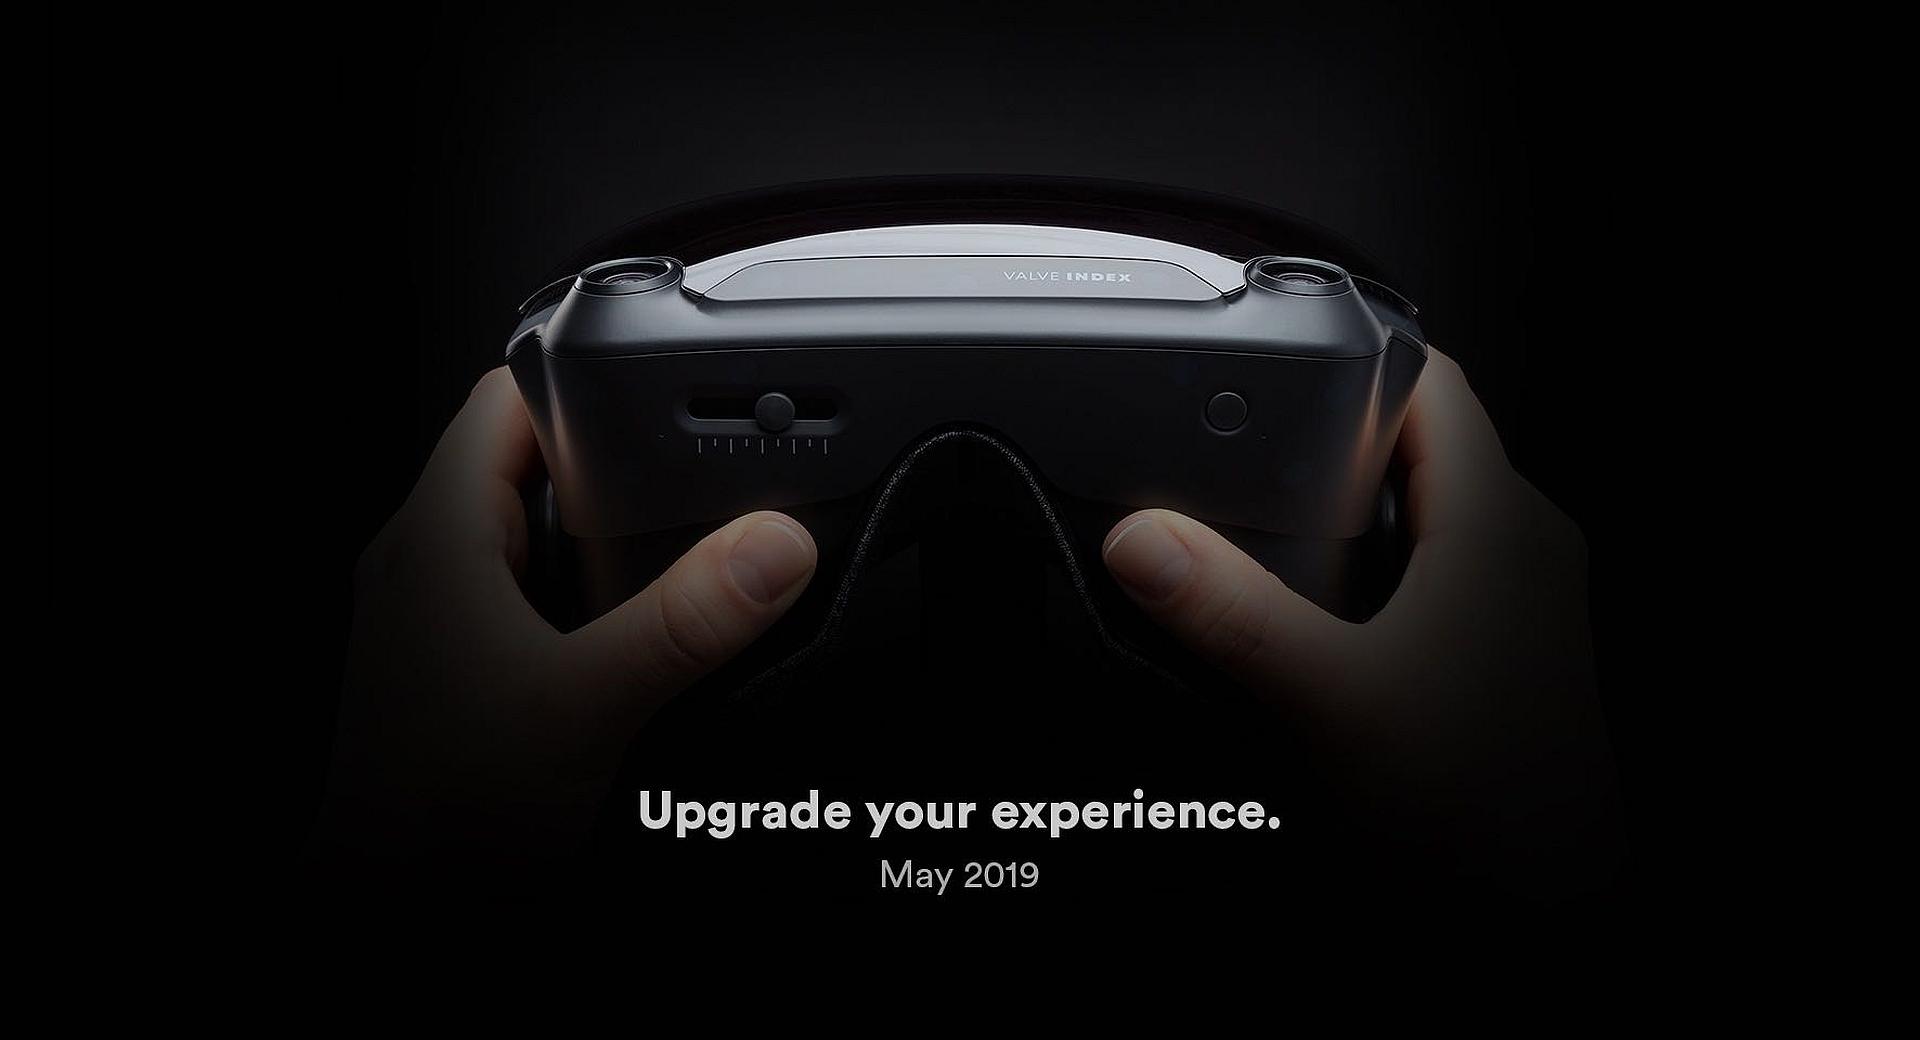 [UPDATE - New Info] Valve Index VR Device Teased on Steam